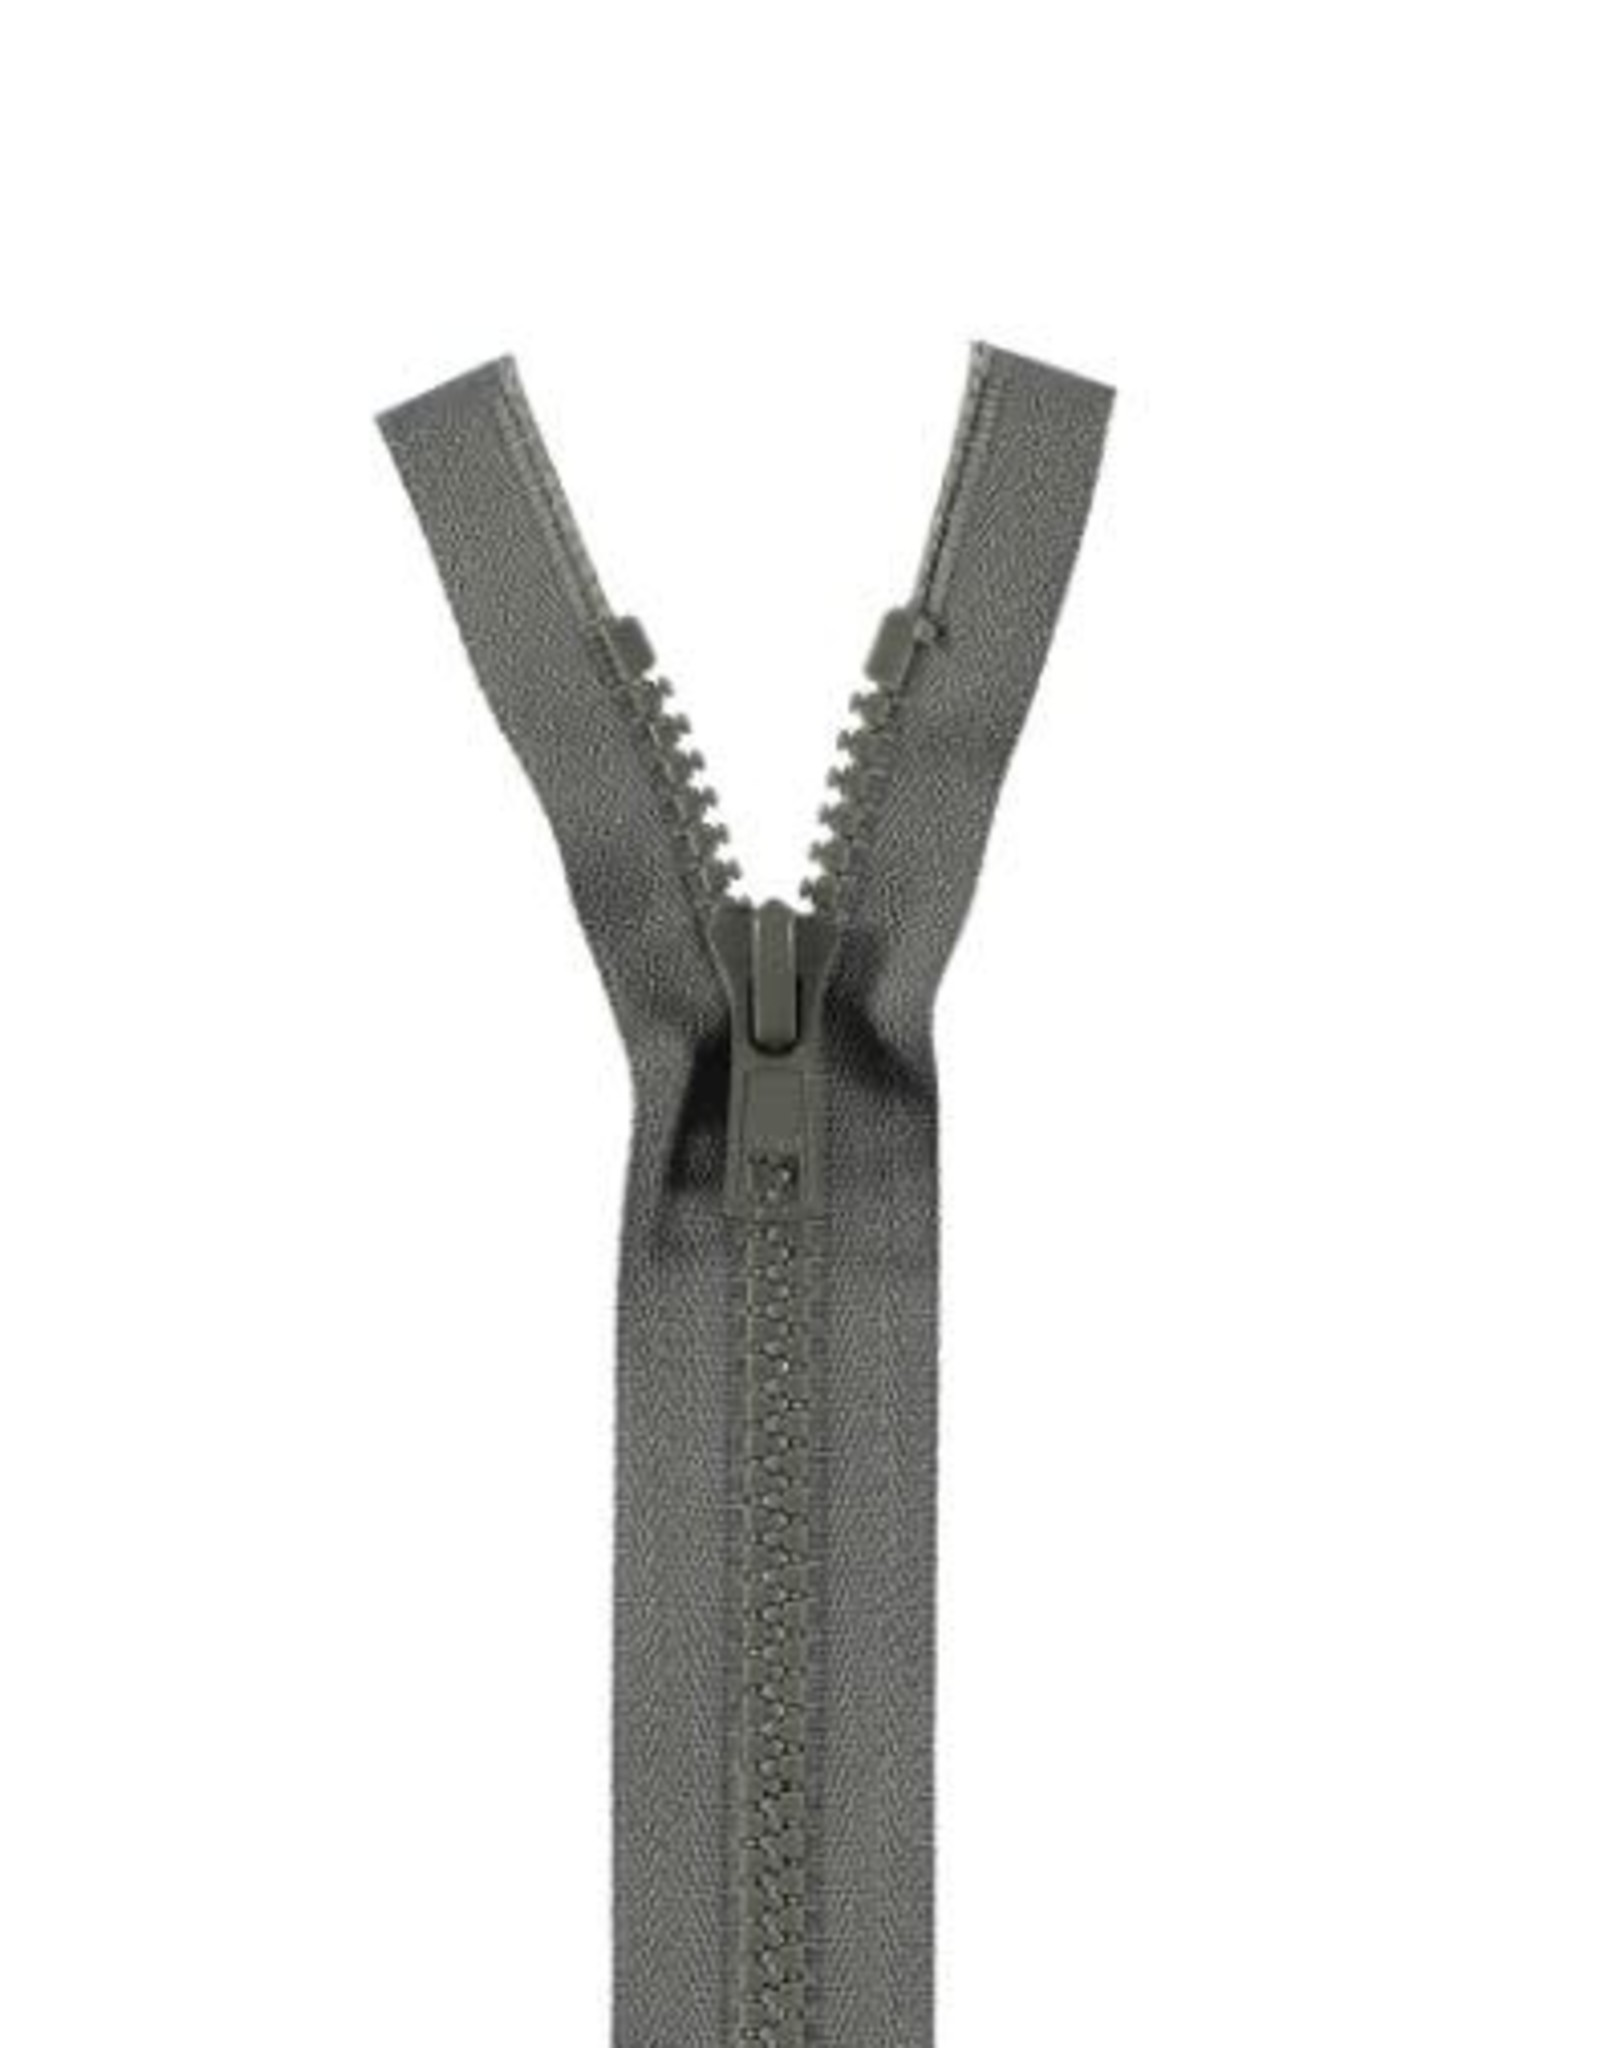 YKK BLOKRITS 5 DEELBAAR grijs 578-40cm